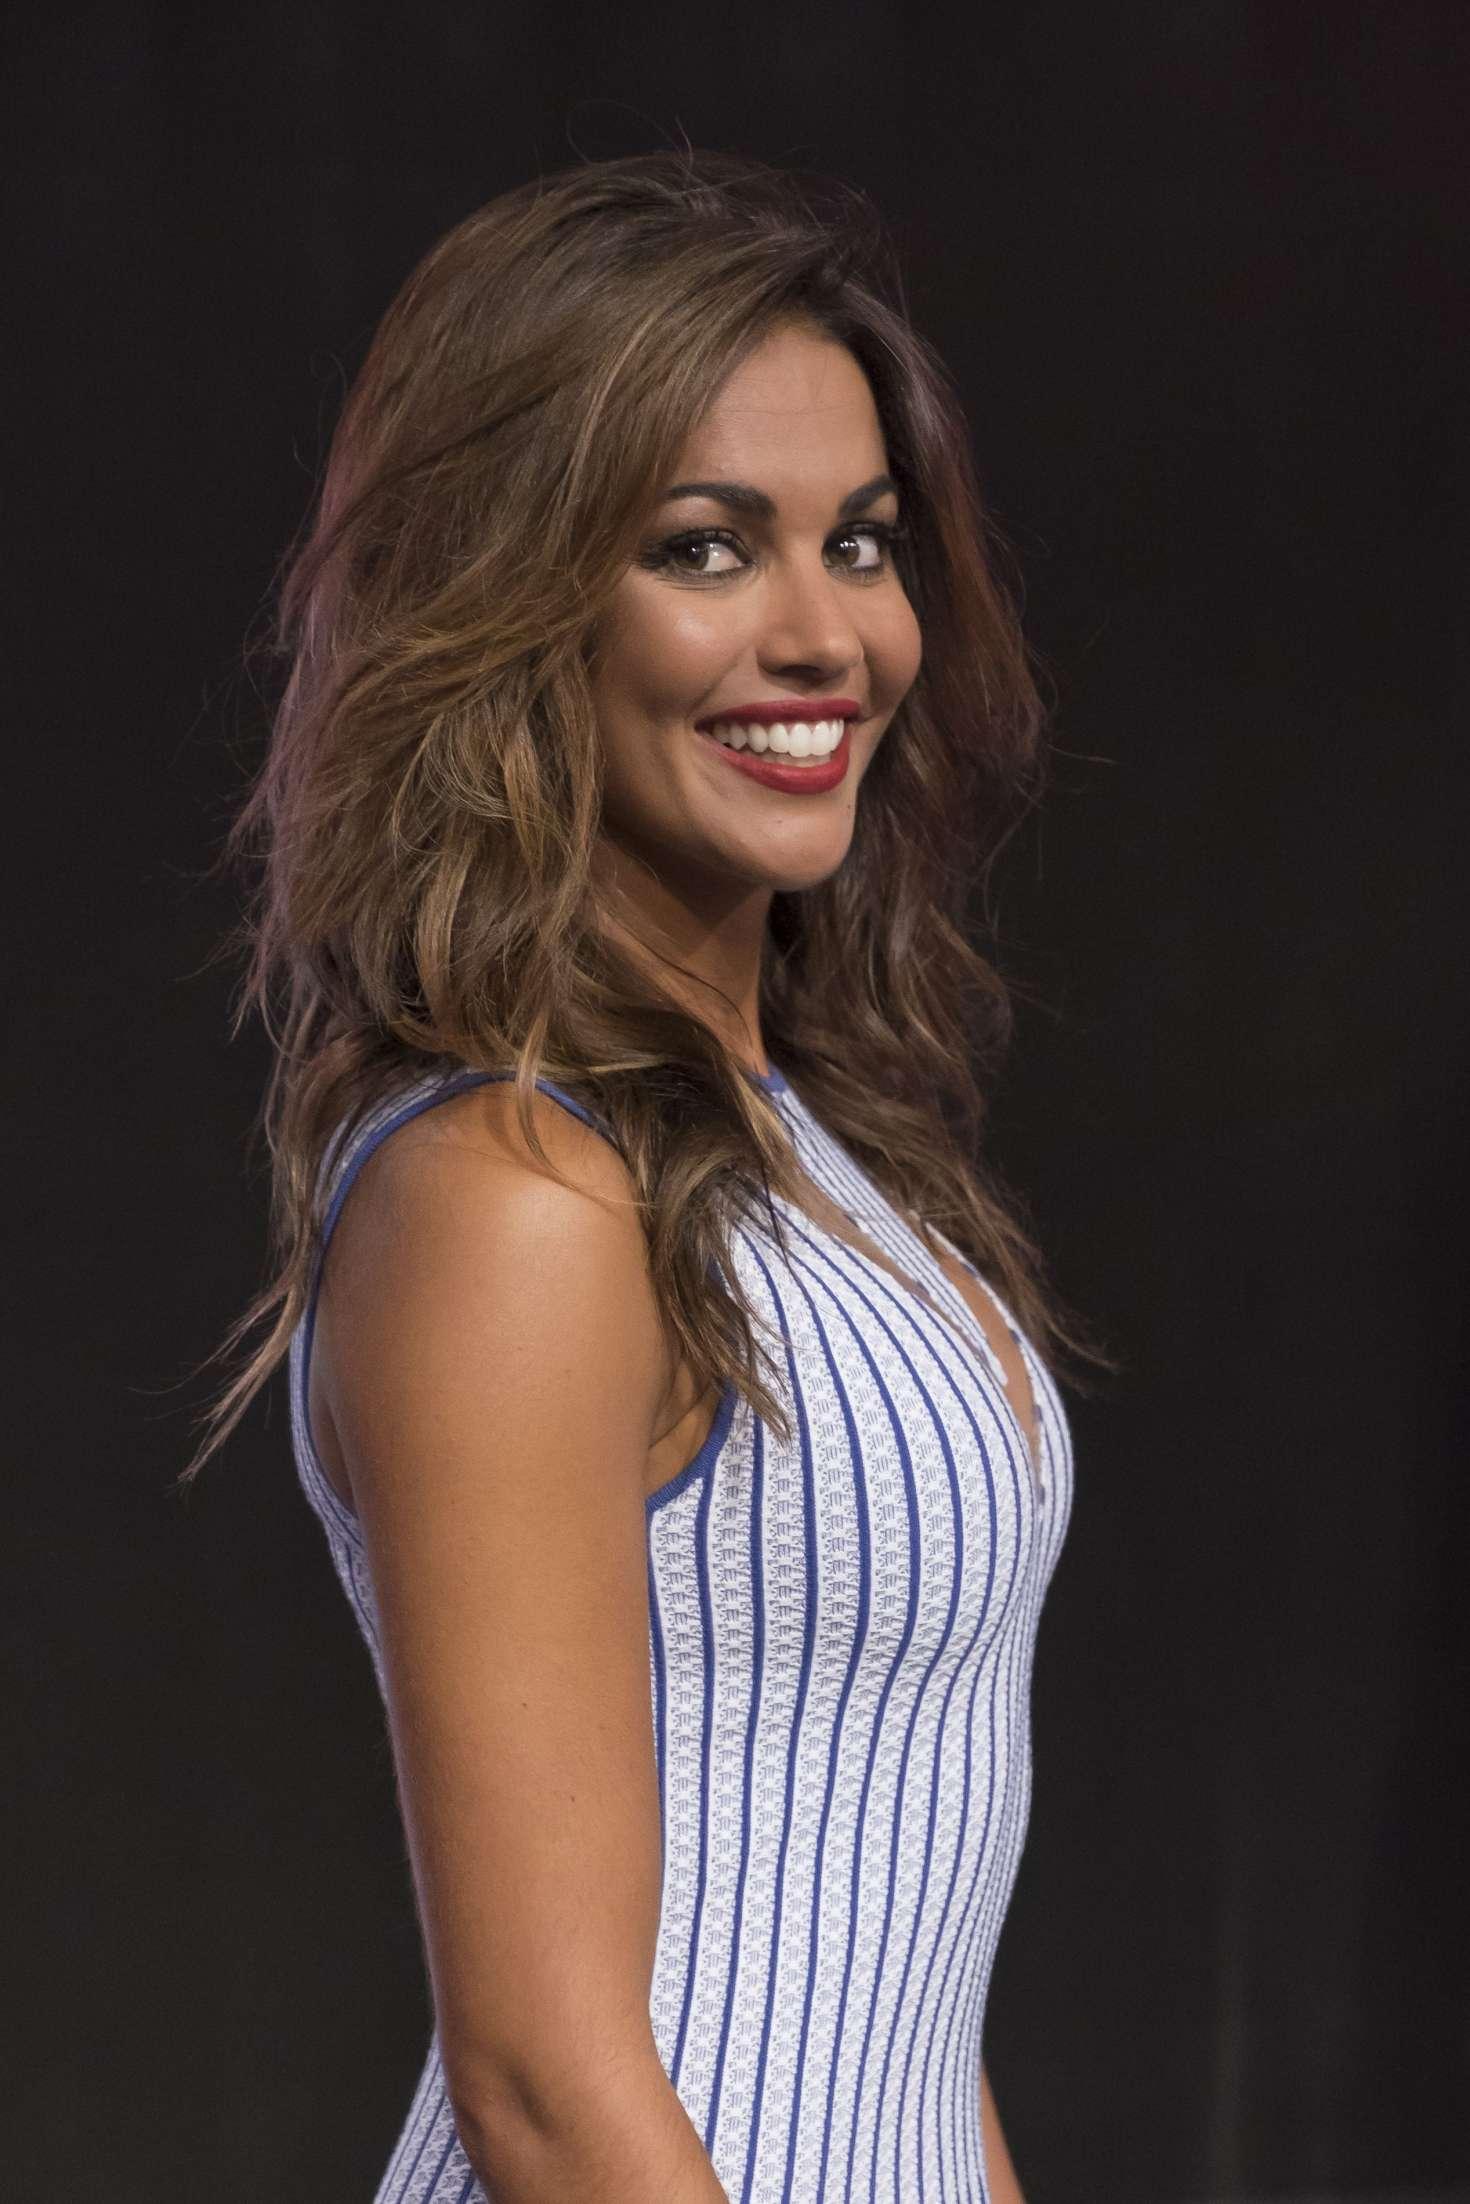 Lara Alvarez at presentation of the TV program GH 17 -04 ...